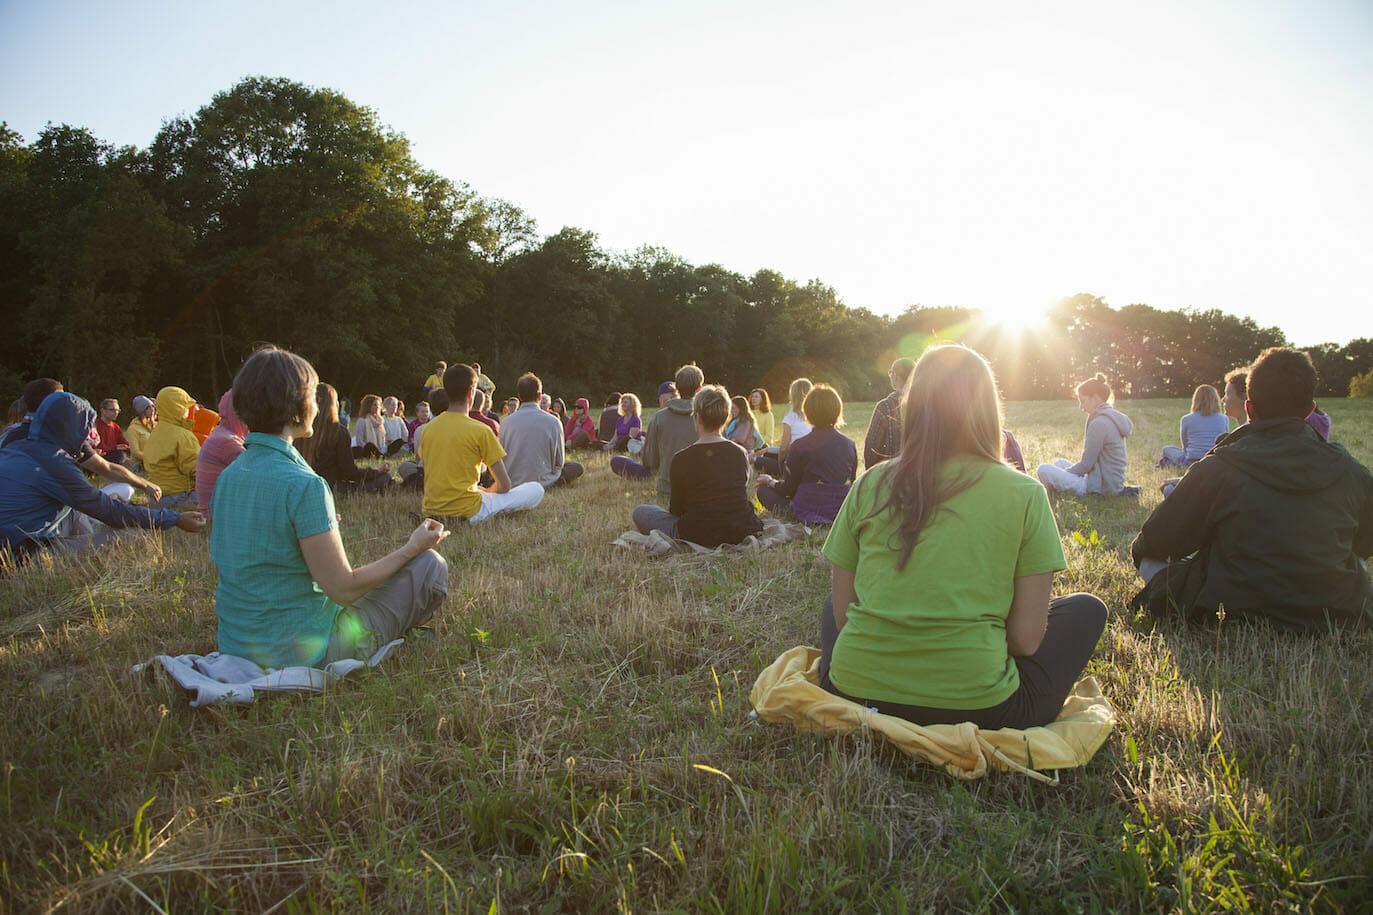 Leading a Yogic Lifestyle | Ashram de Yoga Sivananda | Yoga | France